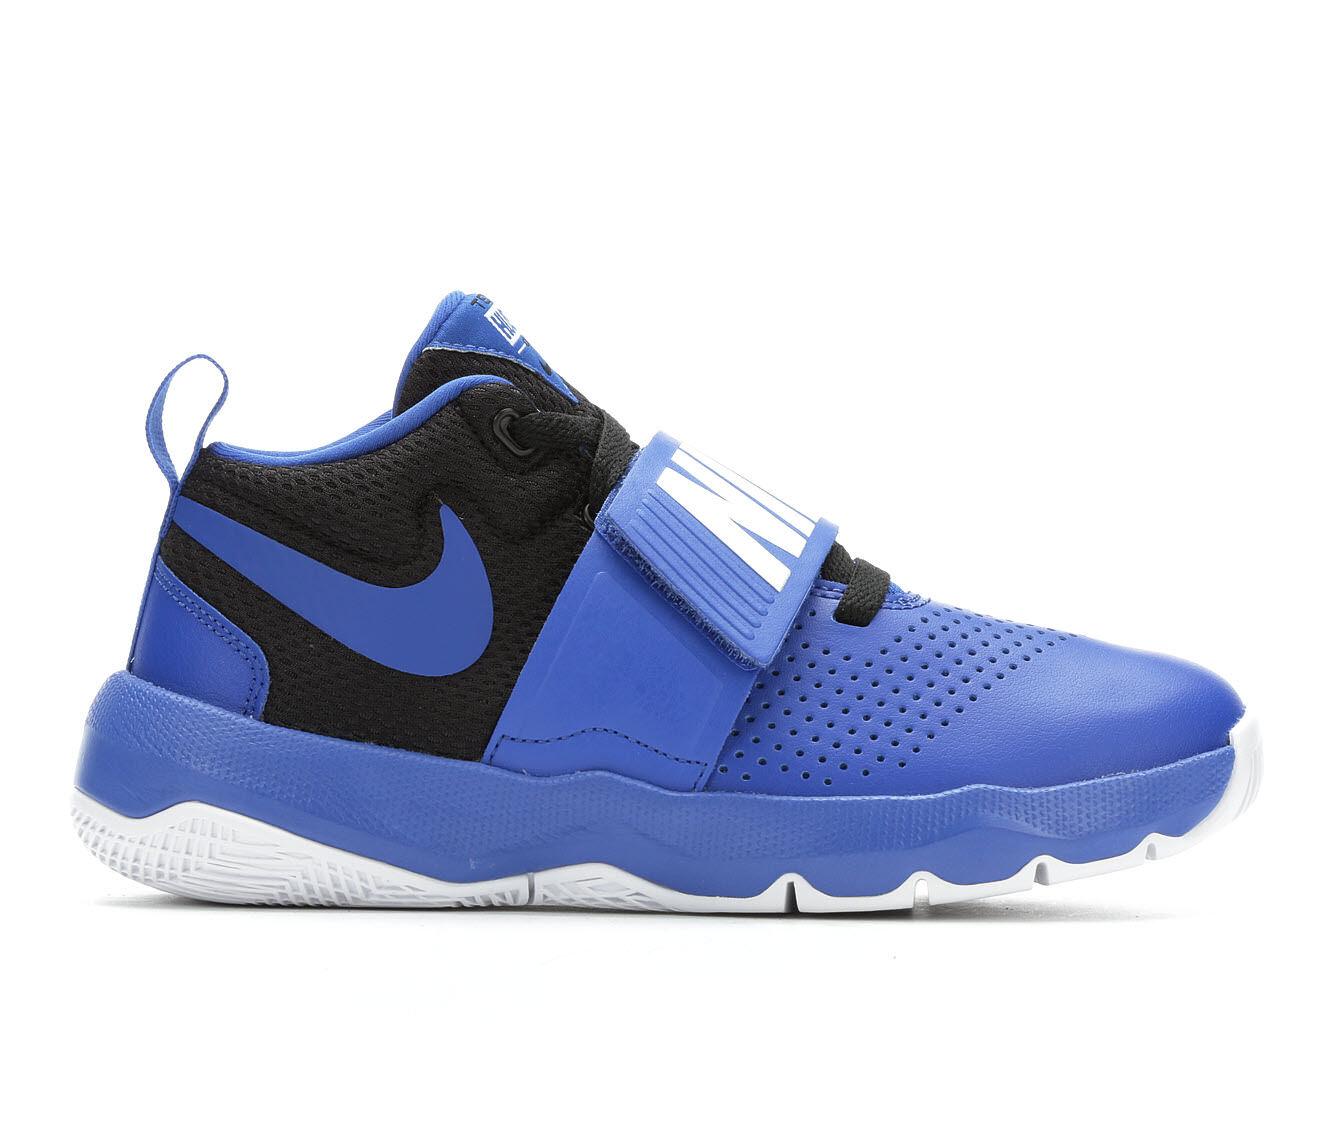 best website 46e70 9ff4c get boys nike team hustle d8 3.5 7 high top basketball shoes 4f1c2 7ad3c